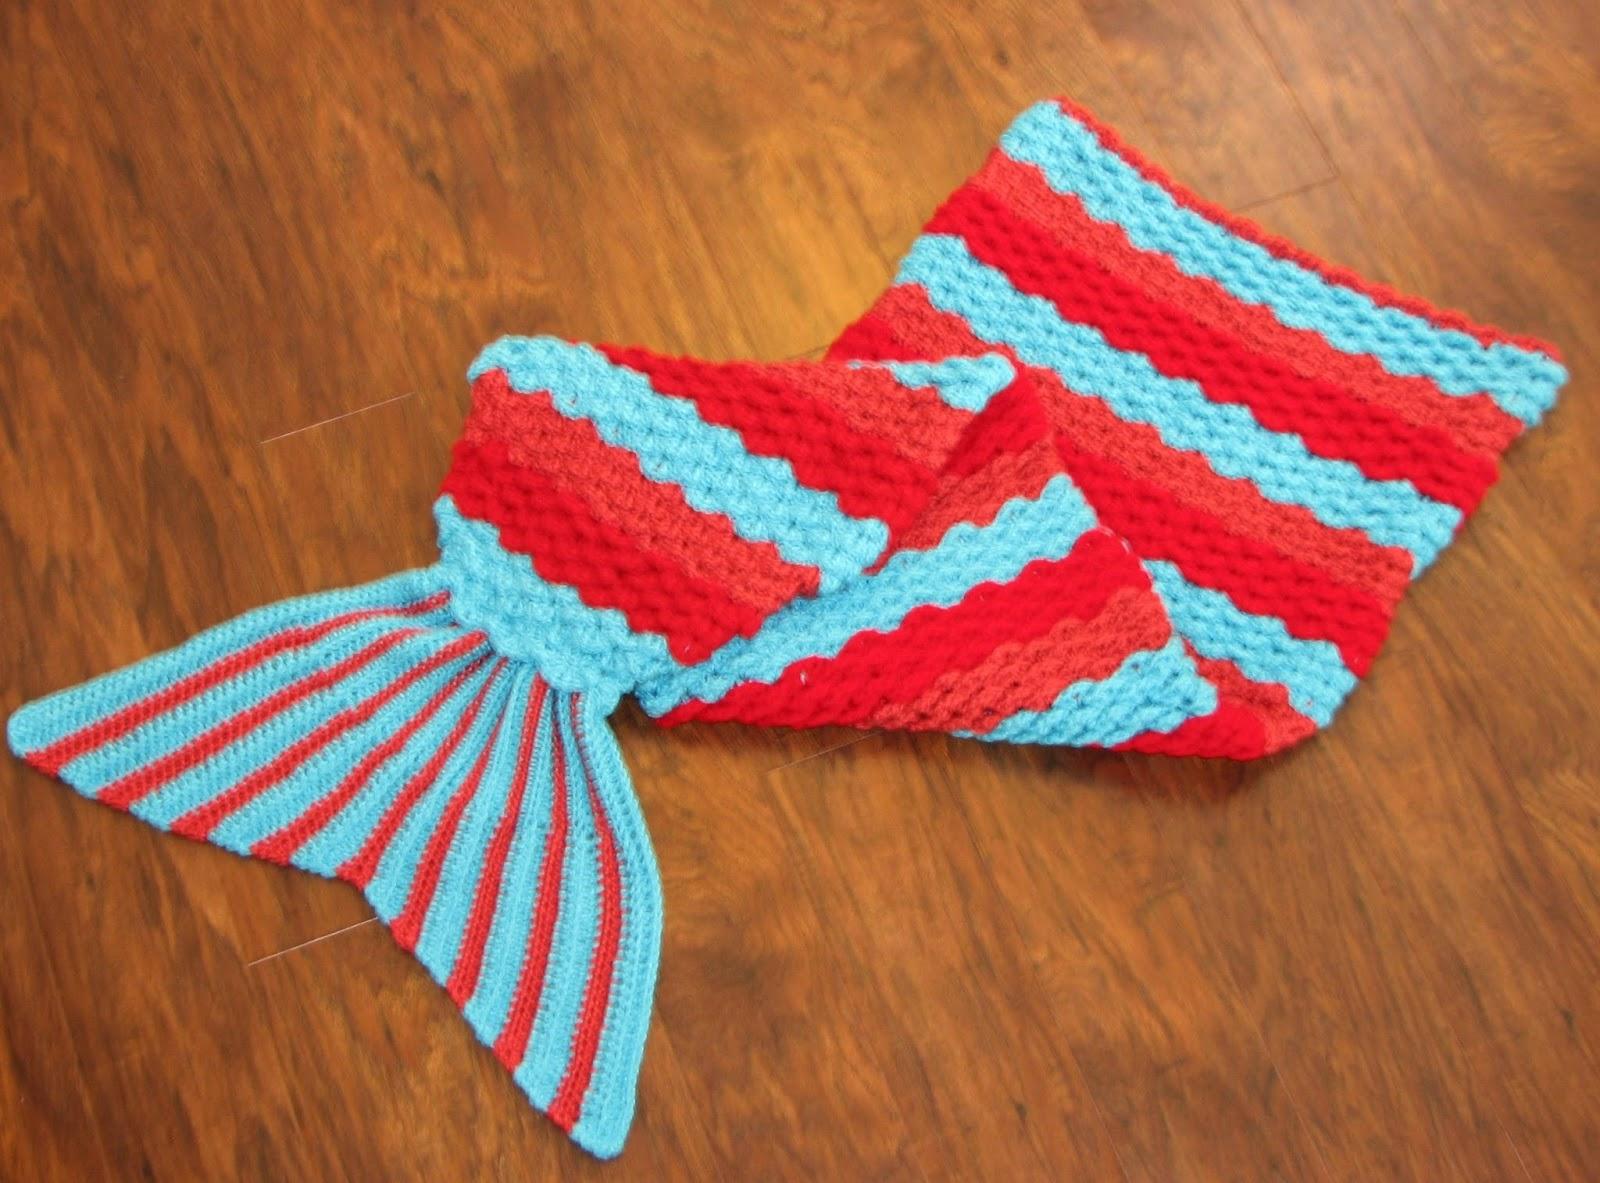 Creative Crochet By Becky Crochet Mermaid Tail Afghan Blanket